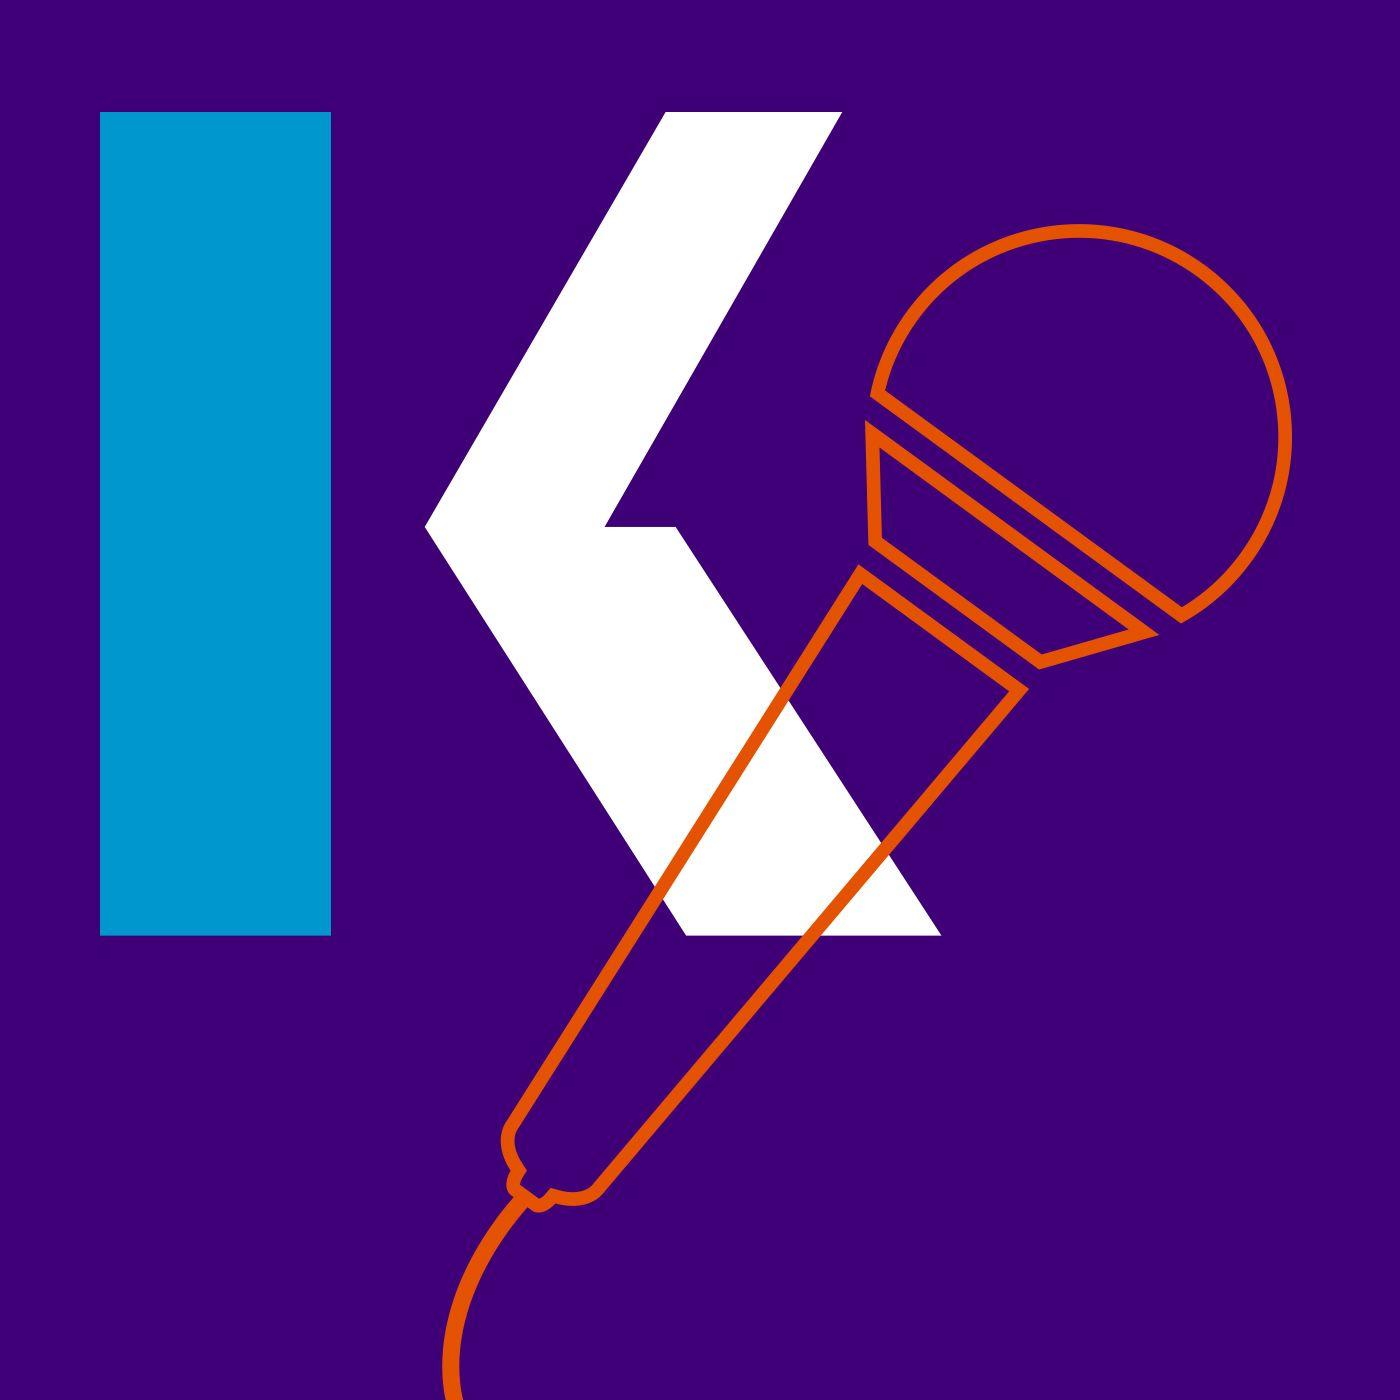 Kaplan's NCLEX Prepcast - Episode 22 - Getting accepted into nursing school